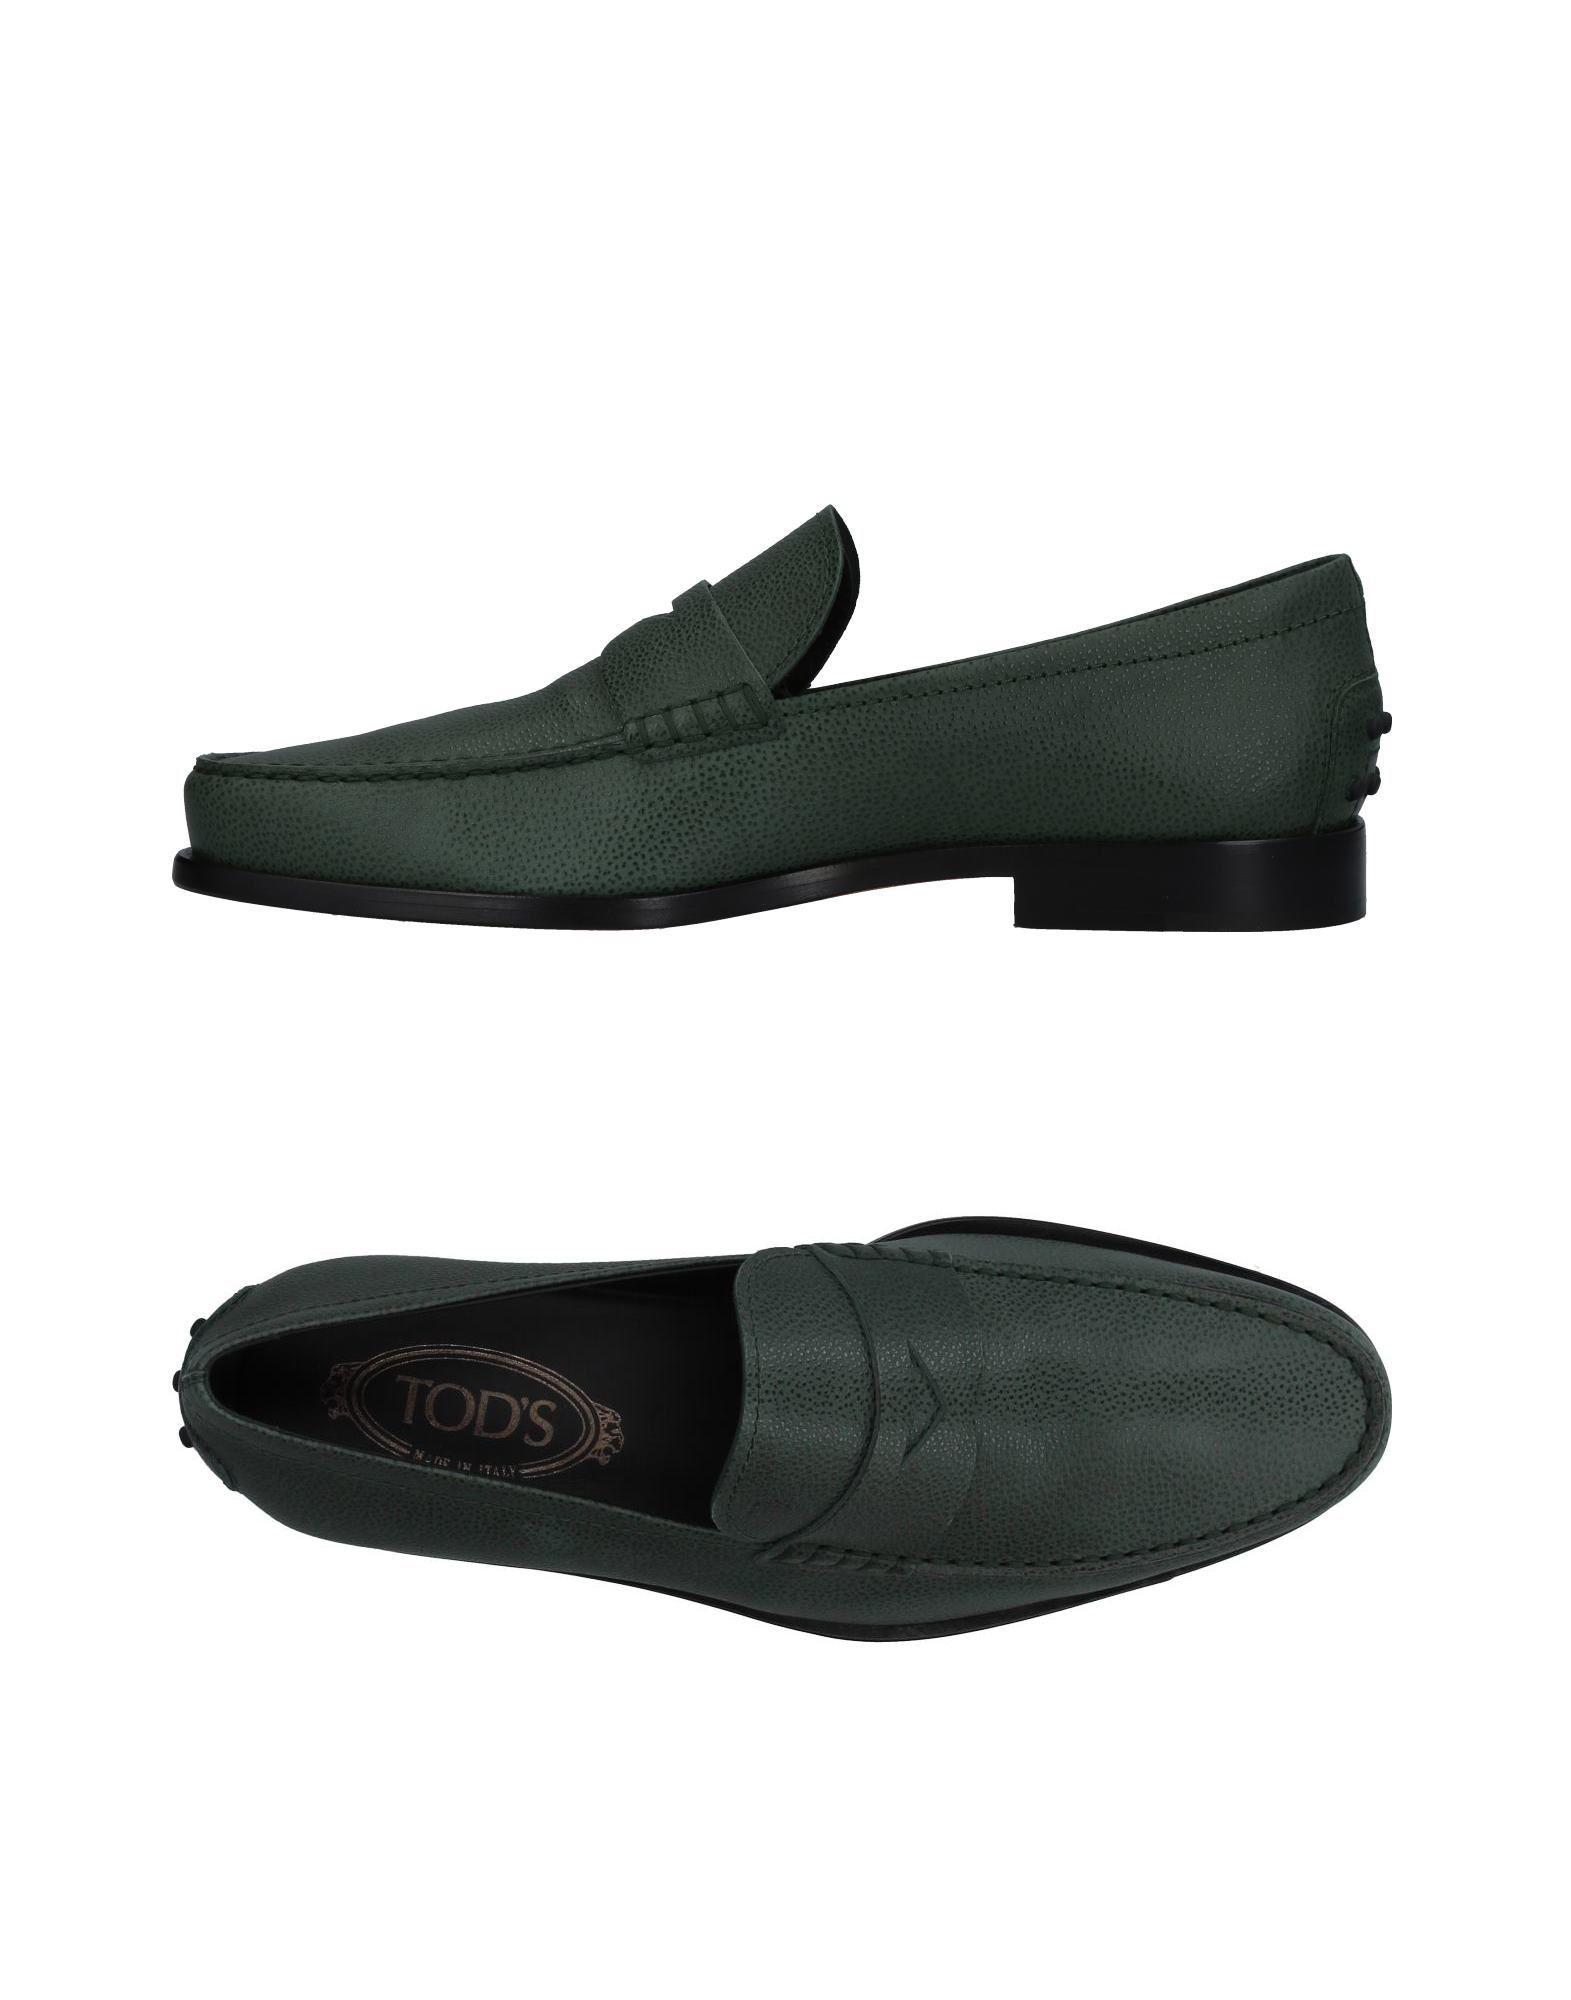 Tod's Mokassins Herren  11412986VG Gute Qualität beliebte Schuhe